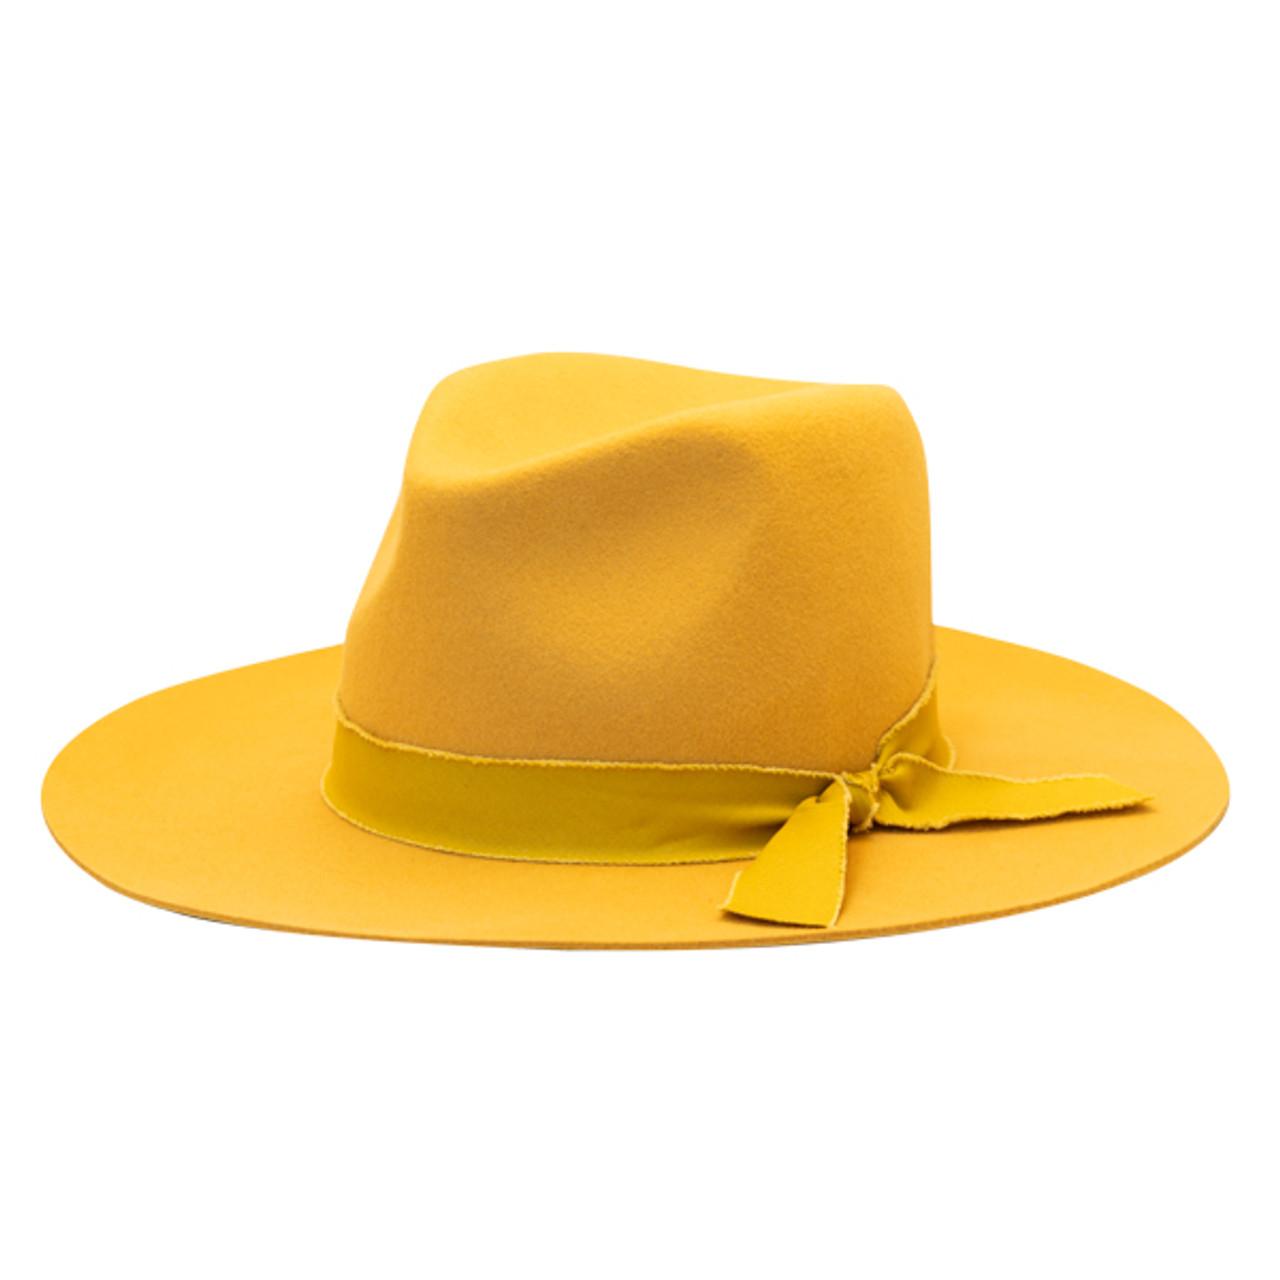 d408a85ca Olive & Pique | Wide Brim Floppy Wool Felt Hat | Hats Unlimited